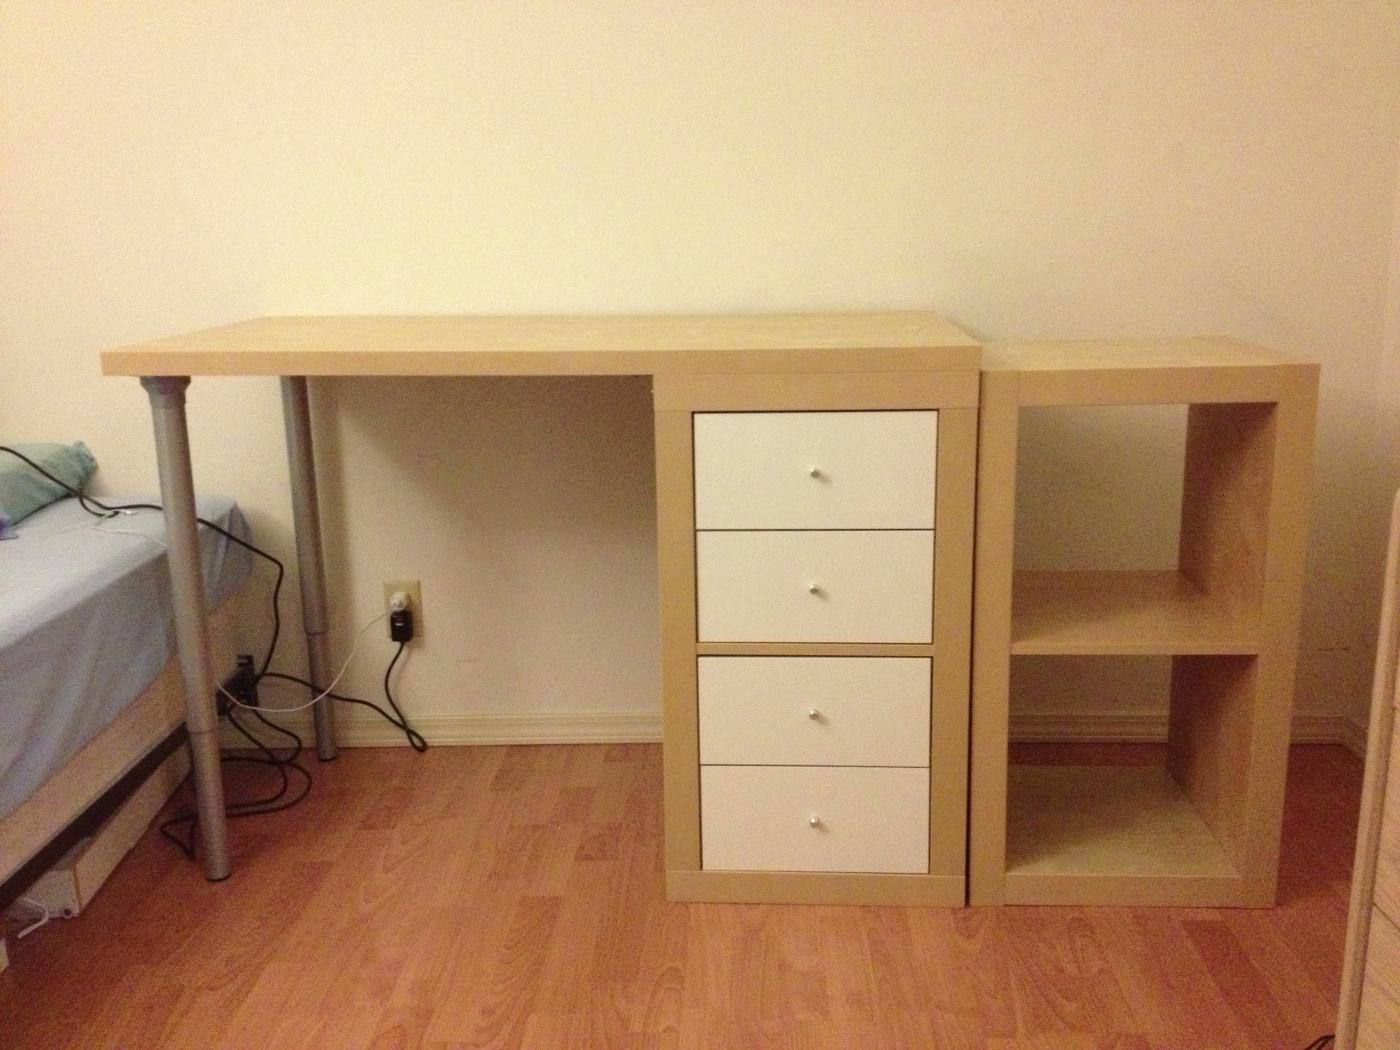 Ikea kallax linnmon ikea micke drawer file storage unit with